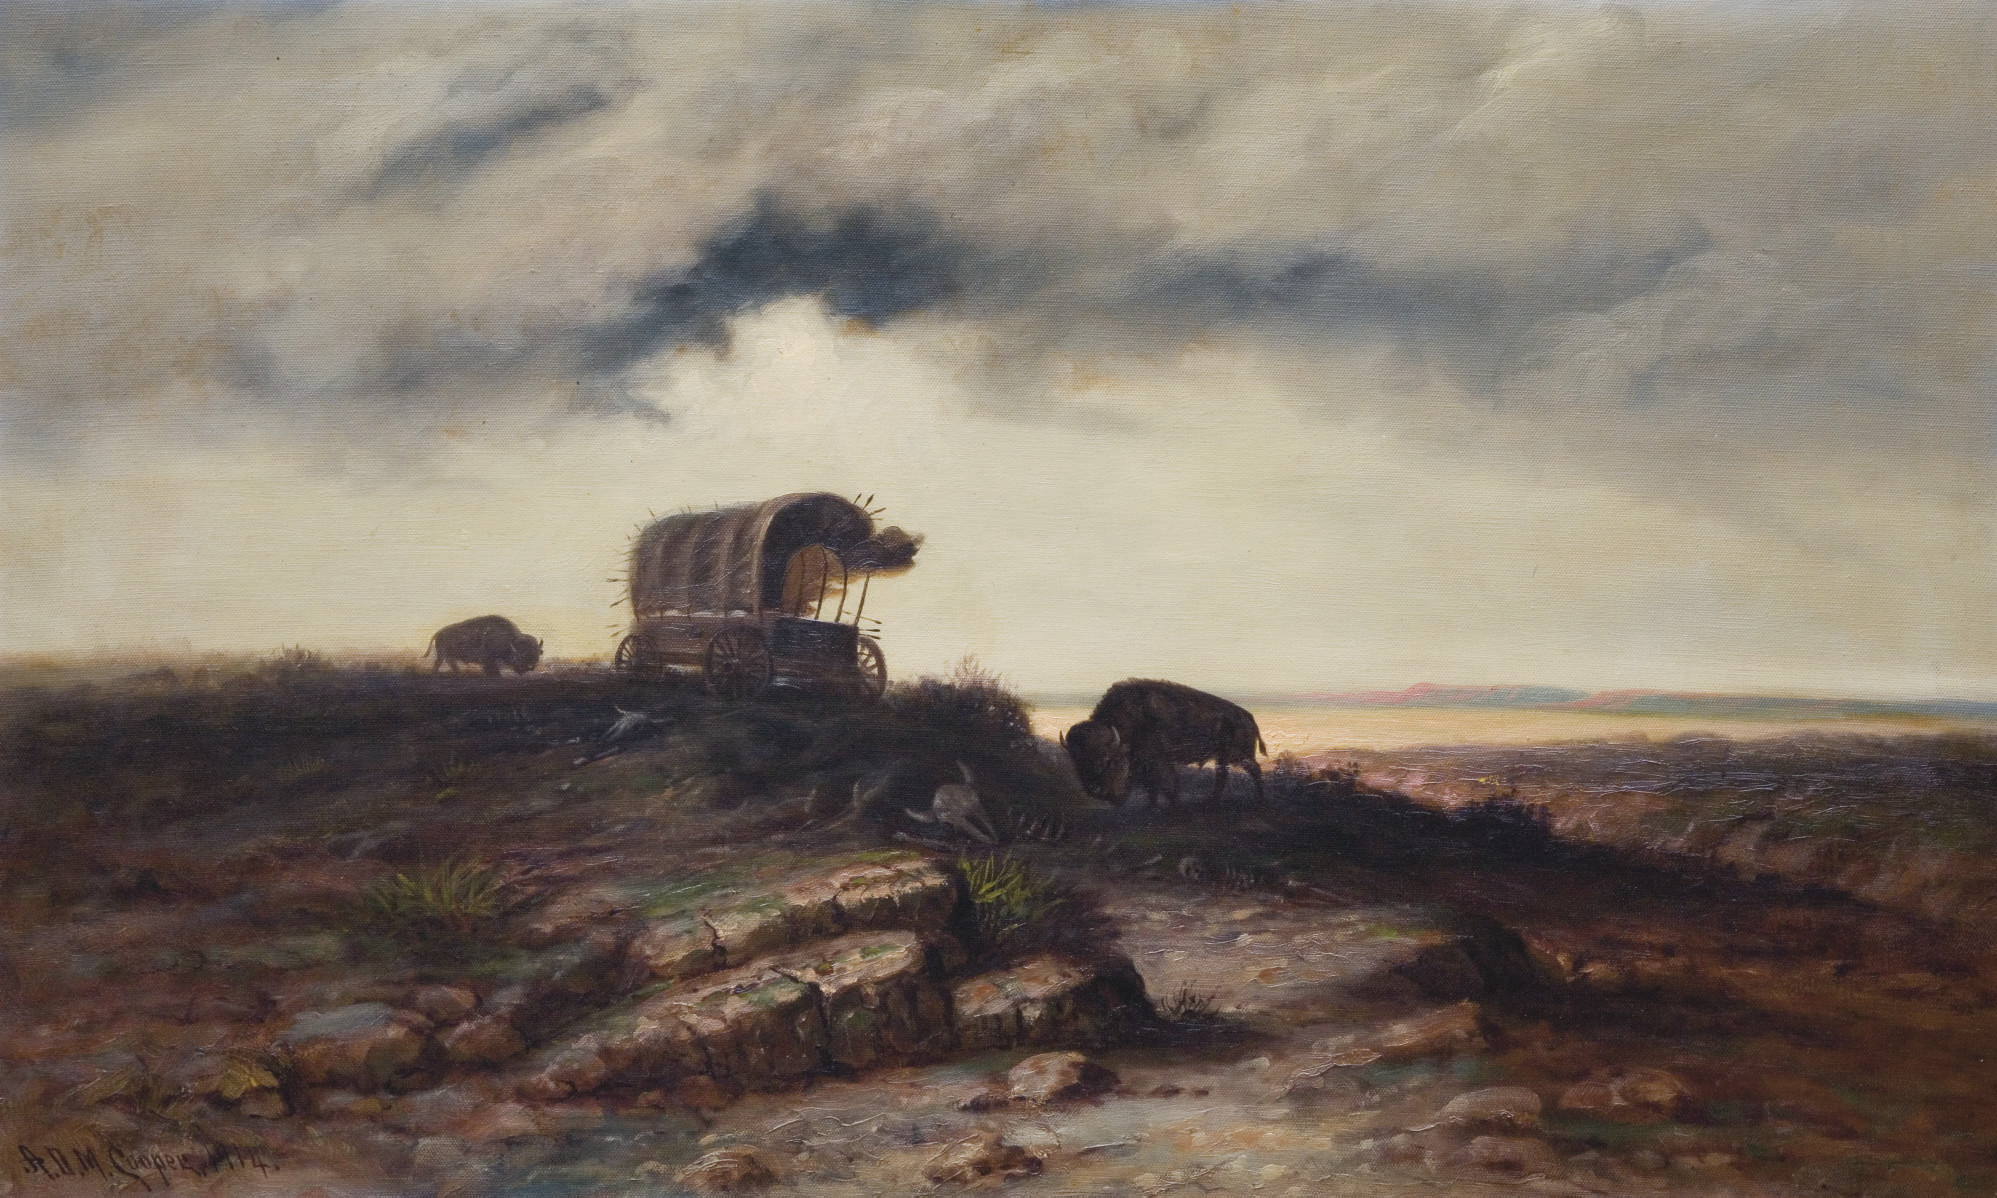 Astley David Montague Cooper (